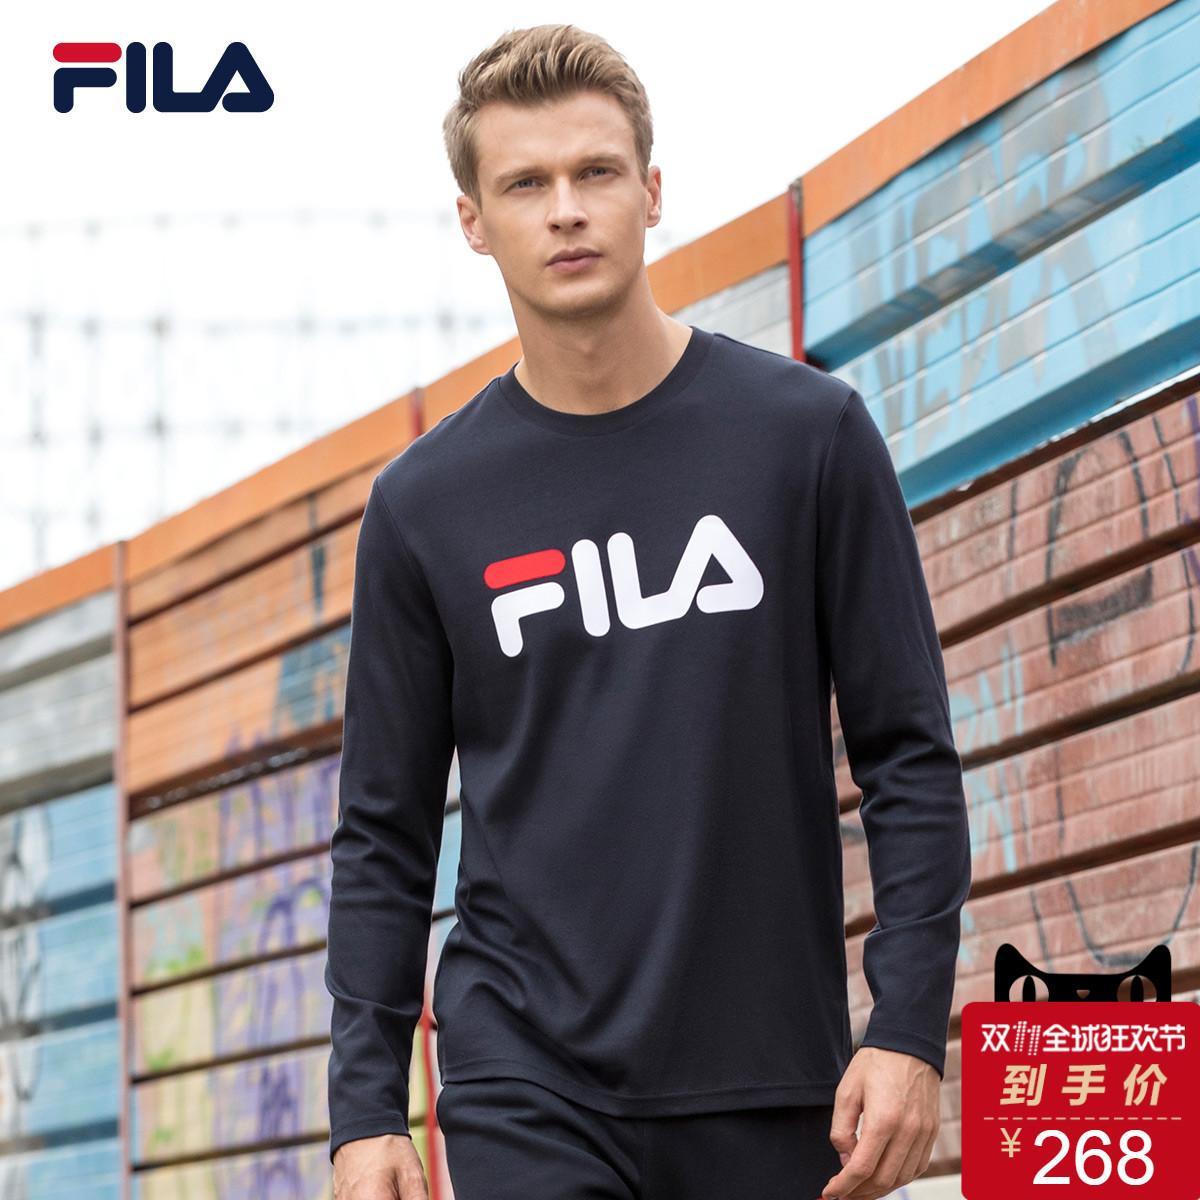 FILA斐乐男针织衫2017冬季新款 运动休闲长袖内搭 纯棉运动T恤男